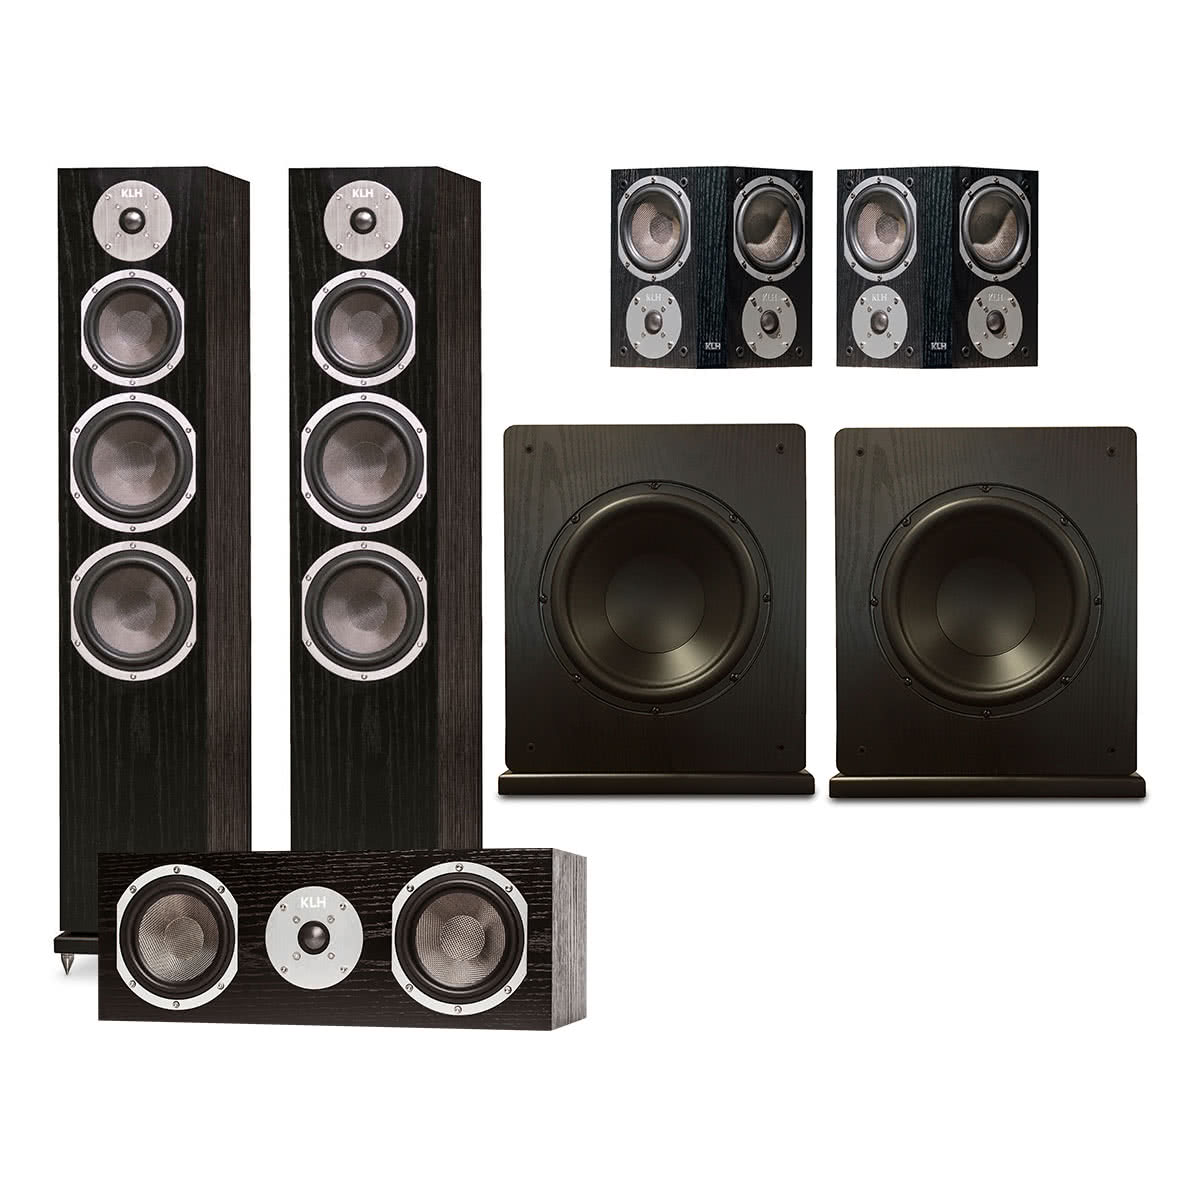 KLH Kendall 5.2 Channel Speaker System (Black Oak)